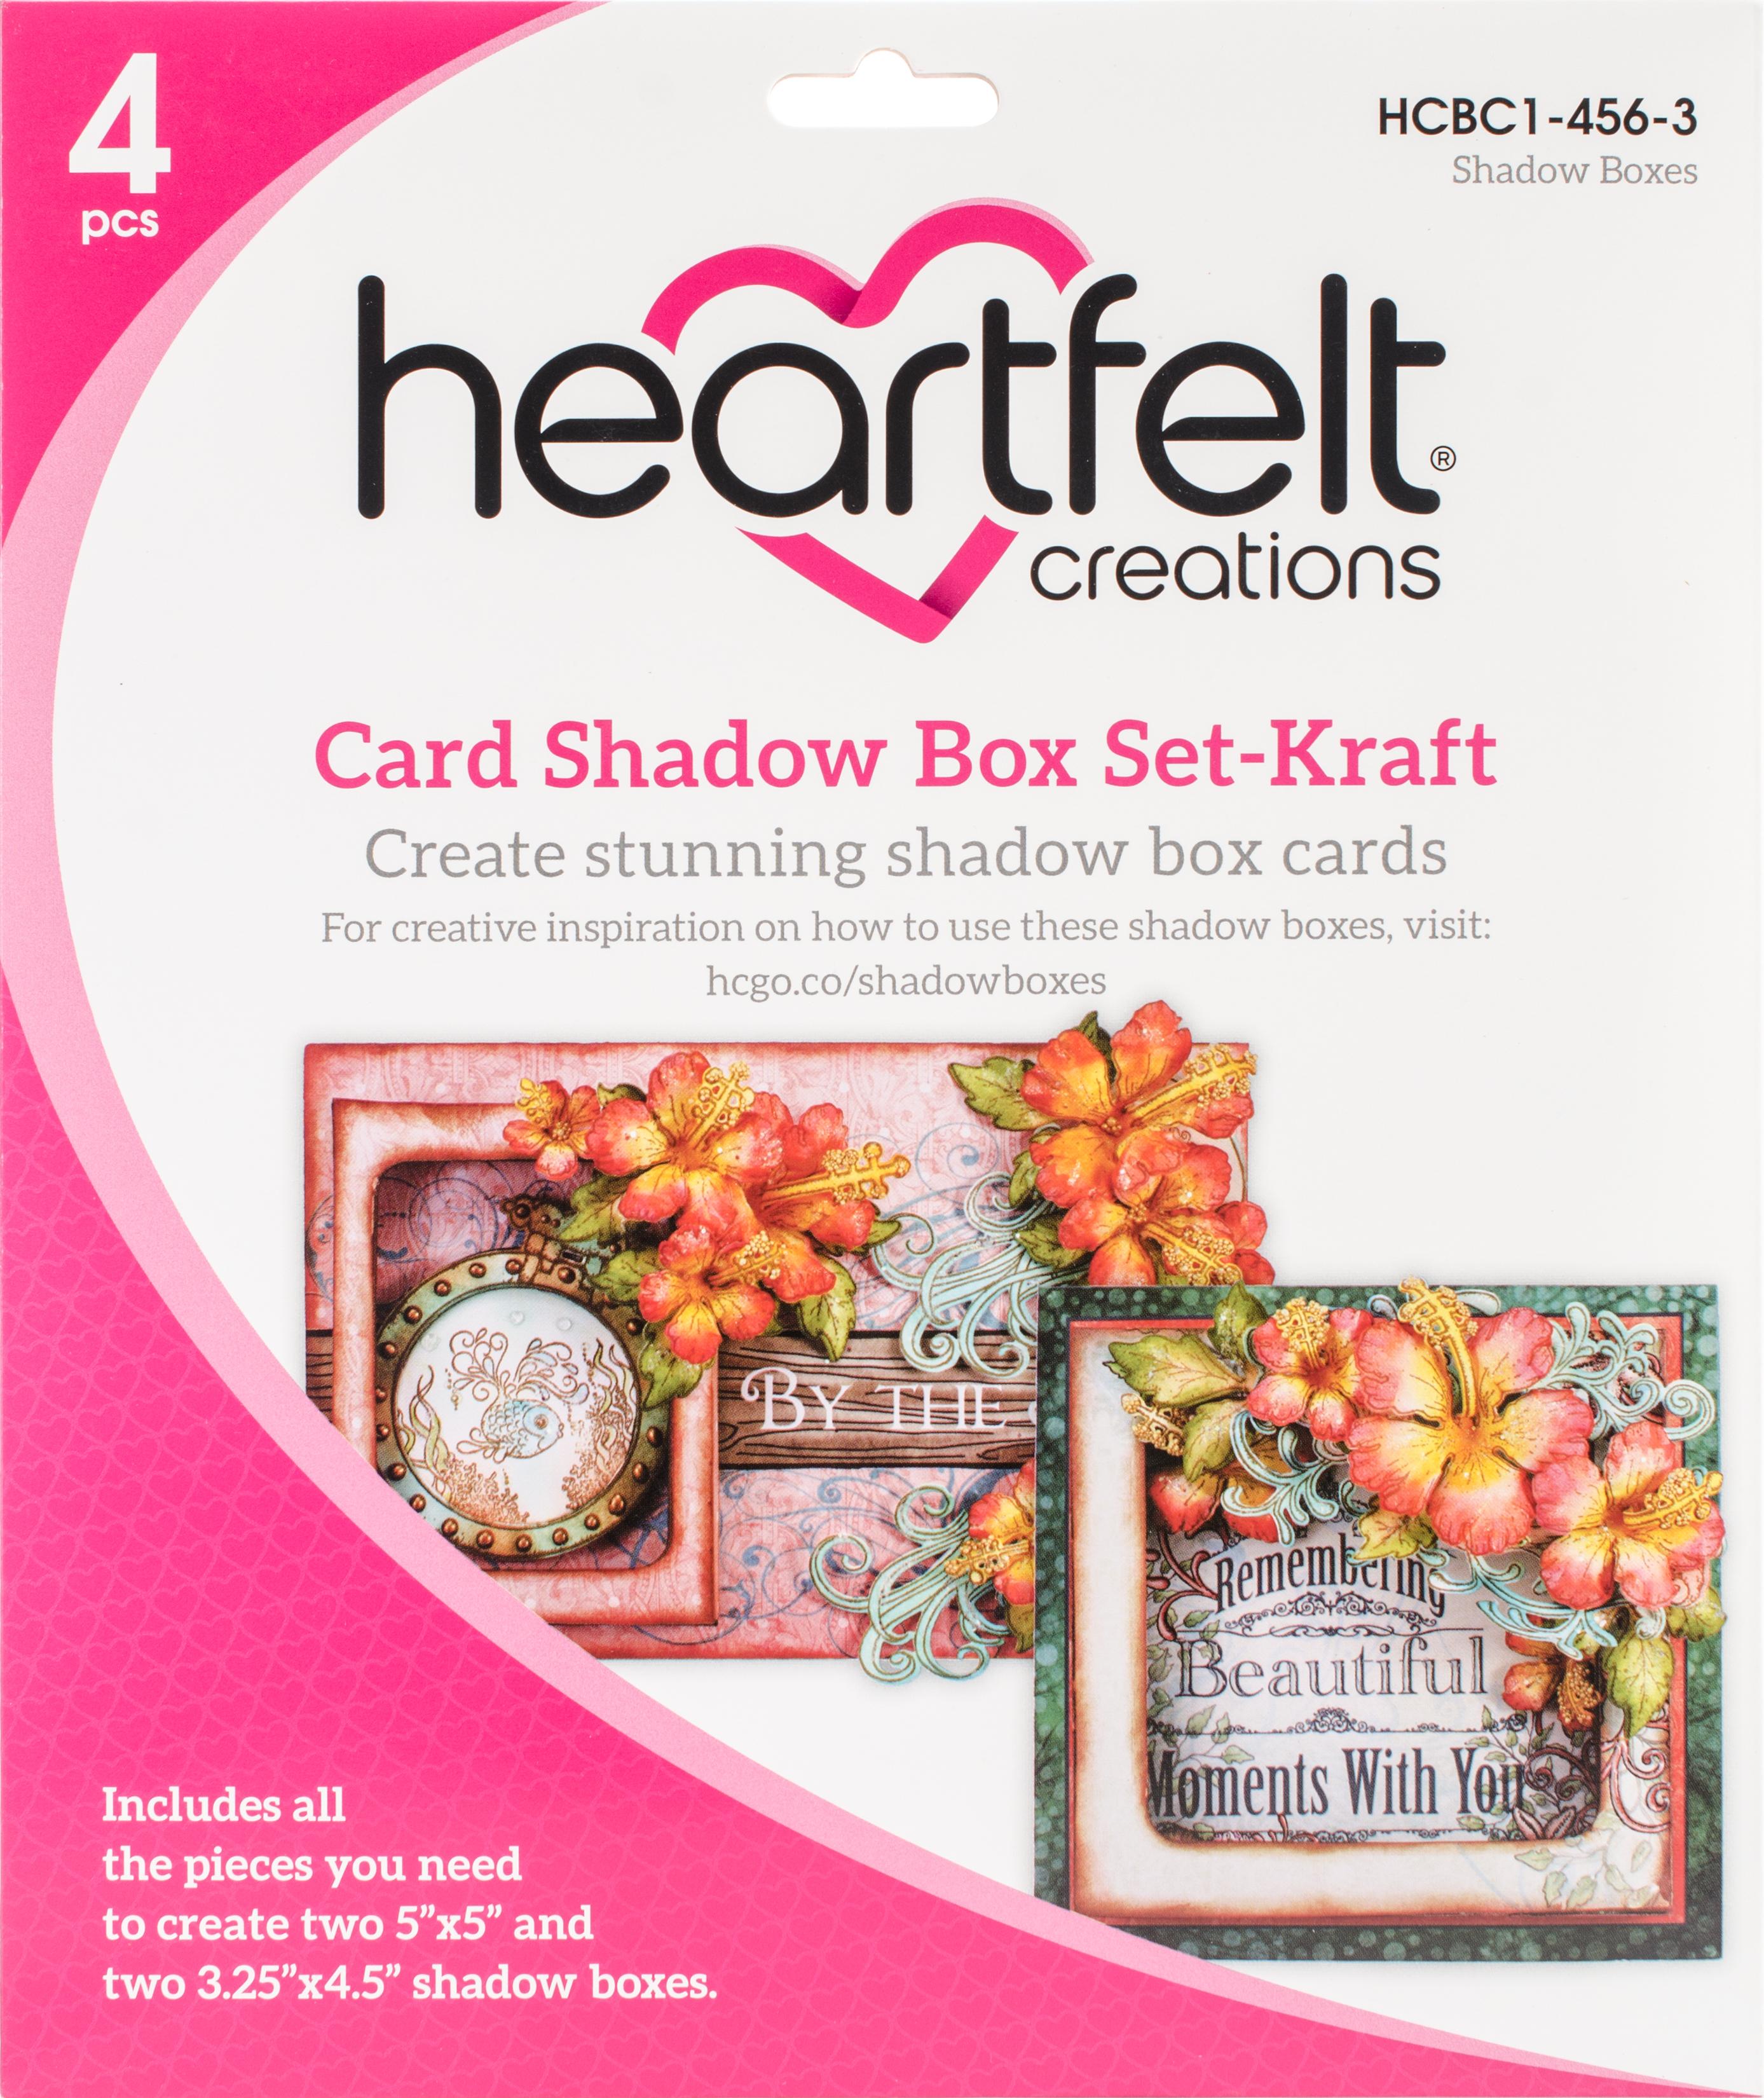 Heartfelt Creations Card Shadow Box Set 2/Pkg-Kraft